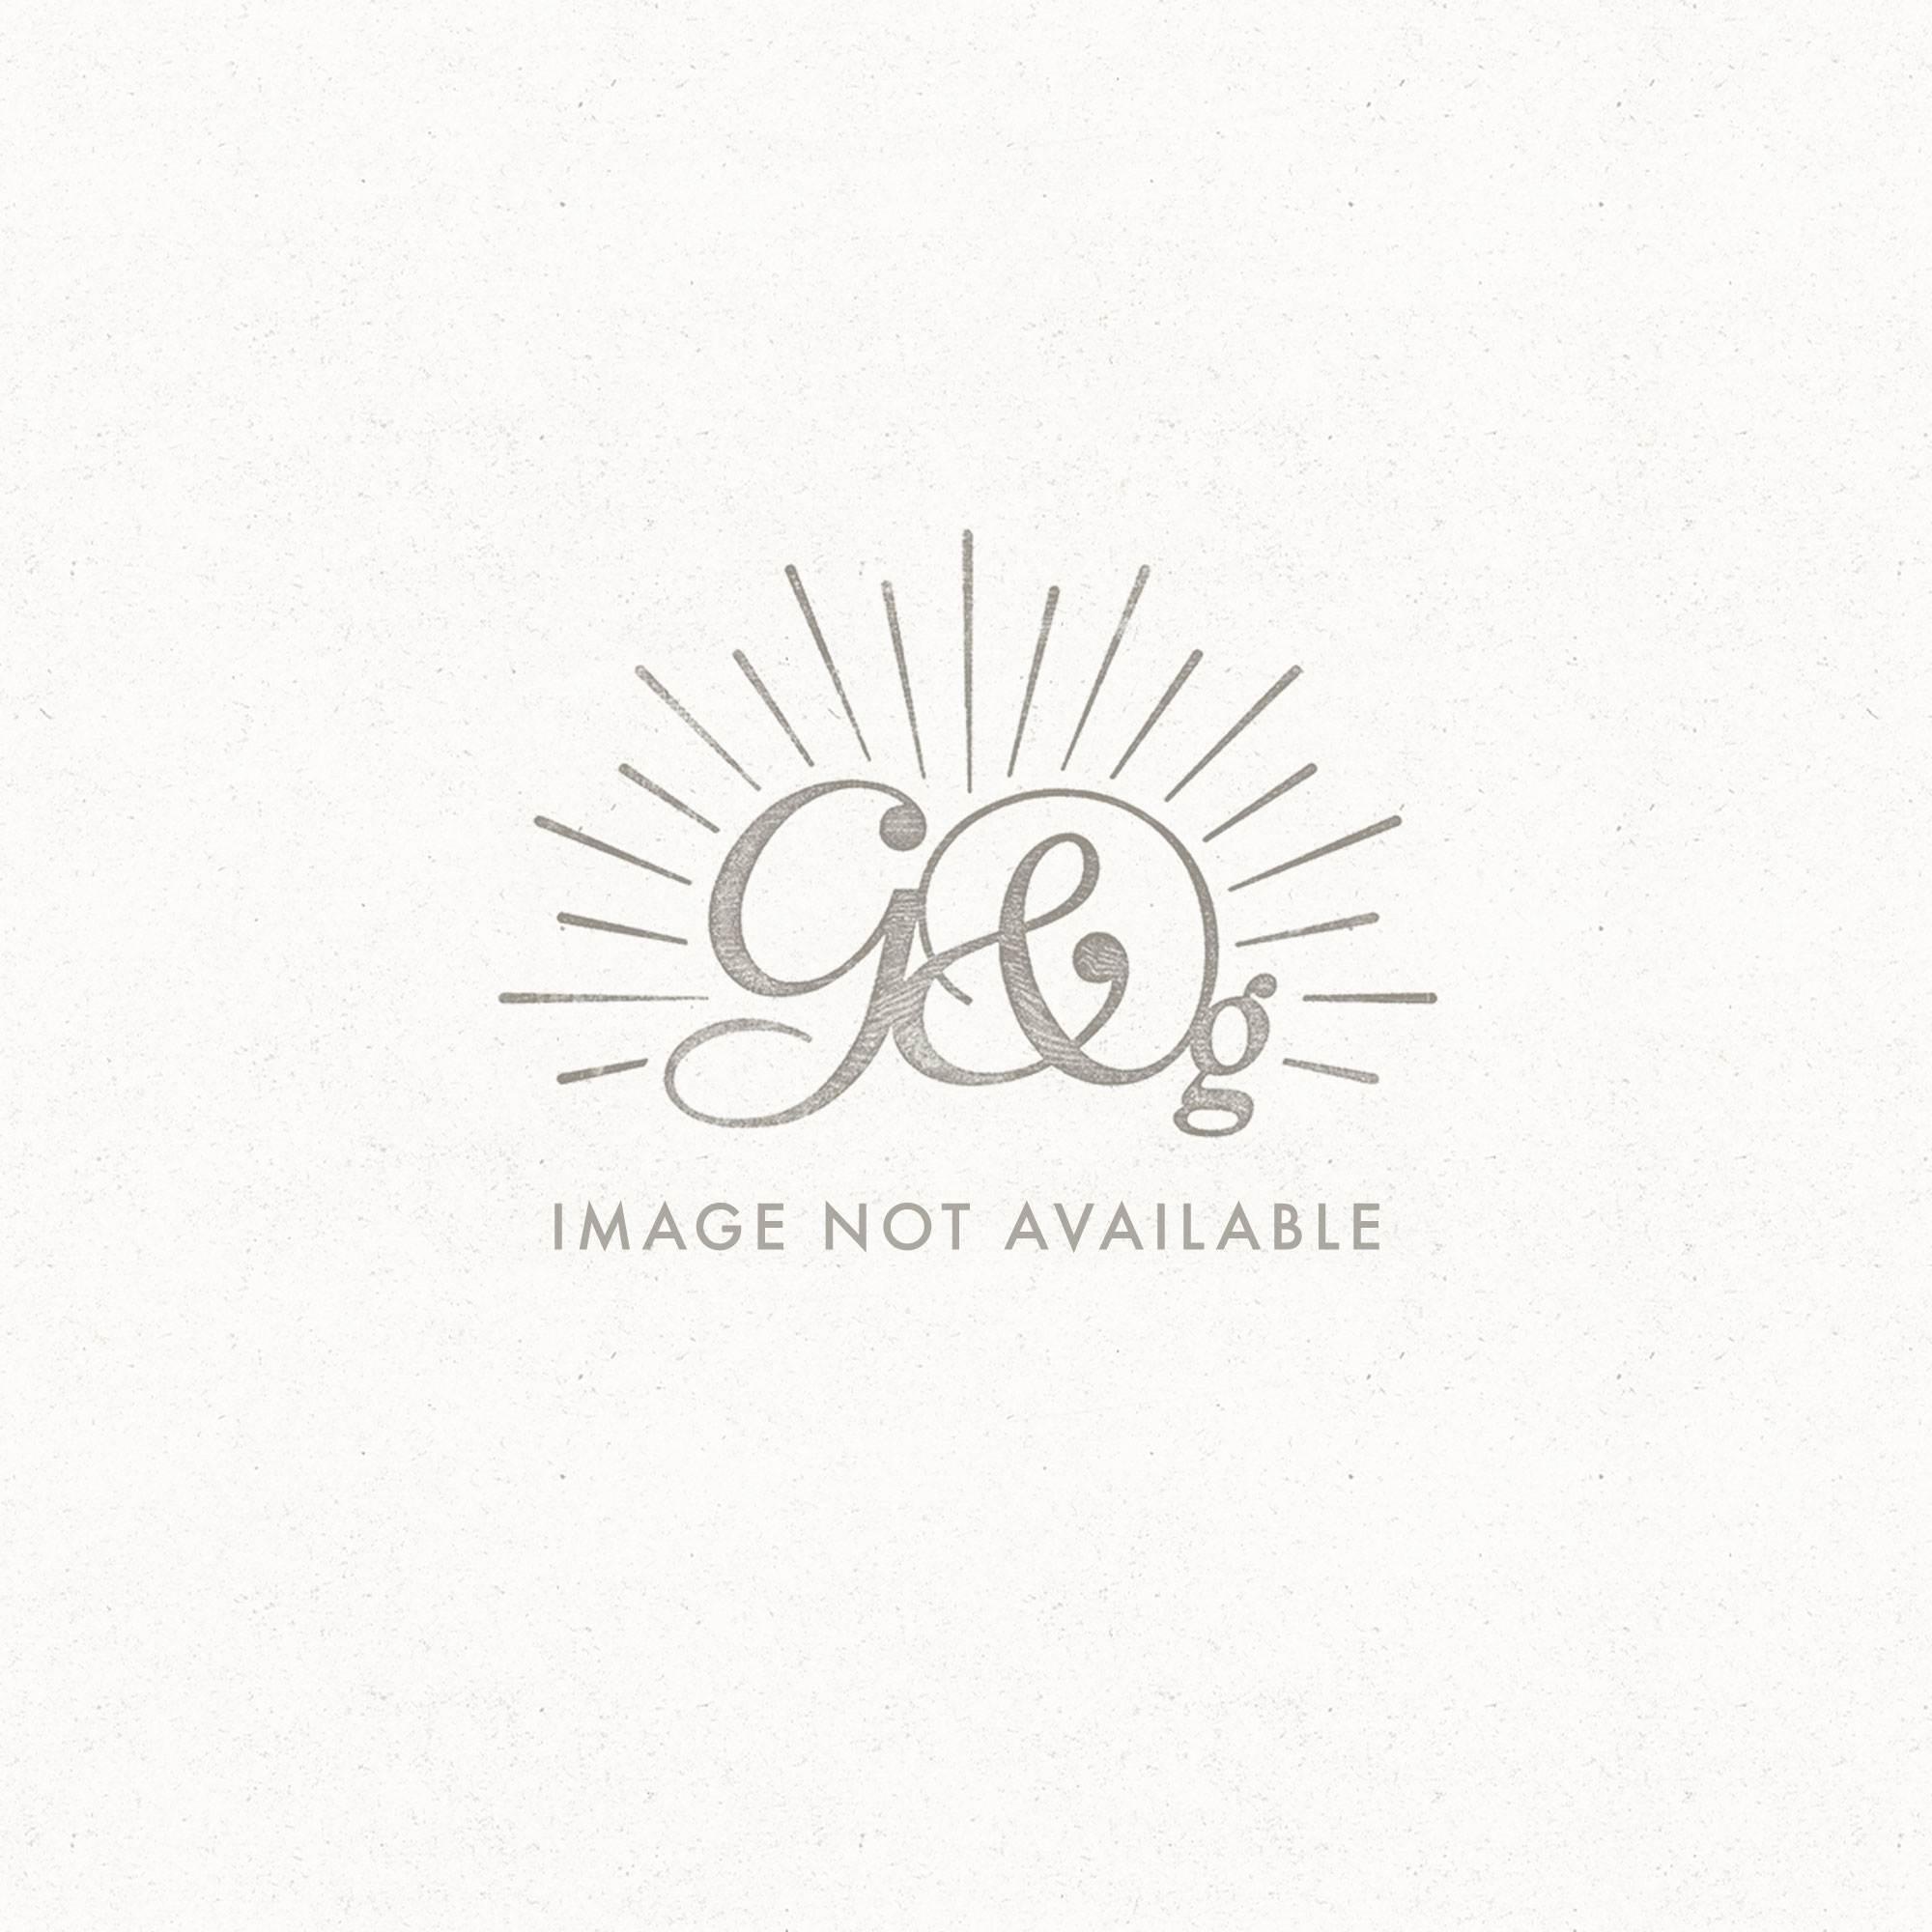 Siena White Ruffle Bed Linen - Thumbnail